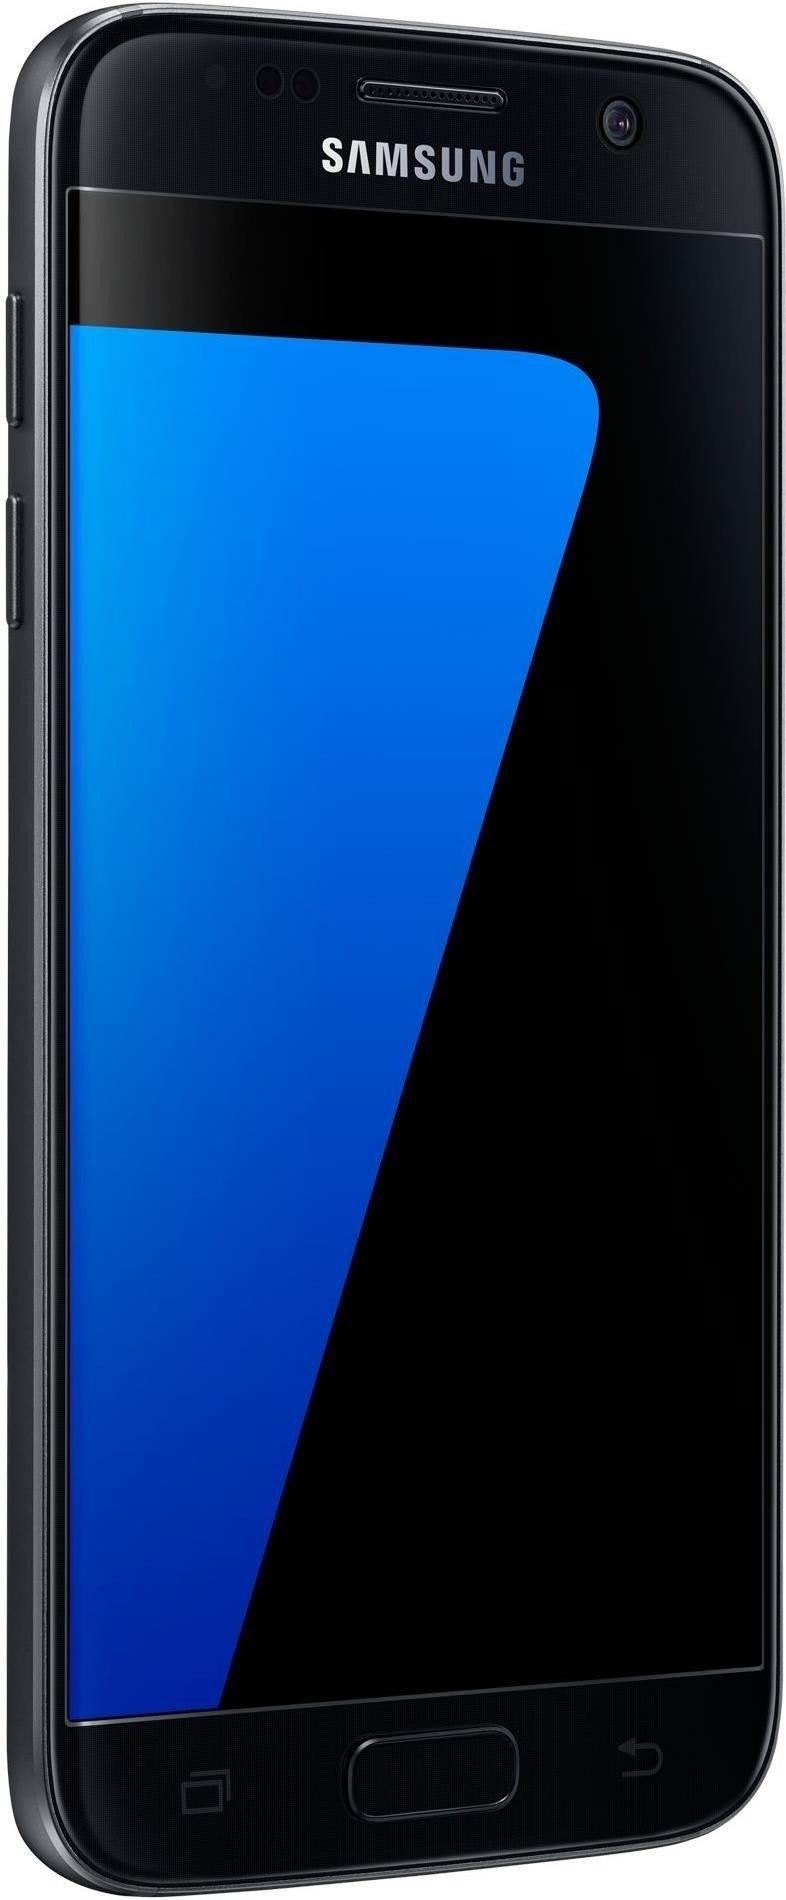 Мобильный телефон Samsung Galaxy S7 Duos G930 (SM-G930FZKUSEK) Black - 3